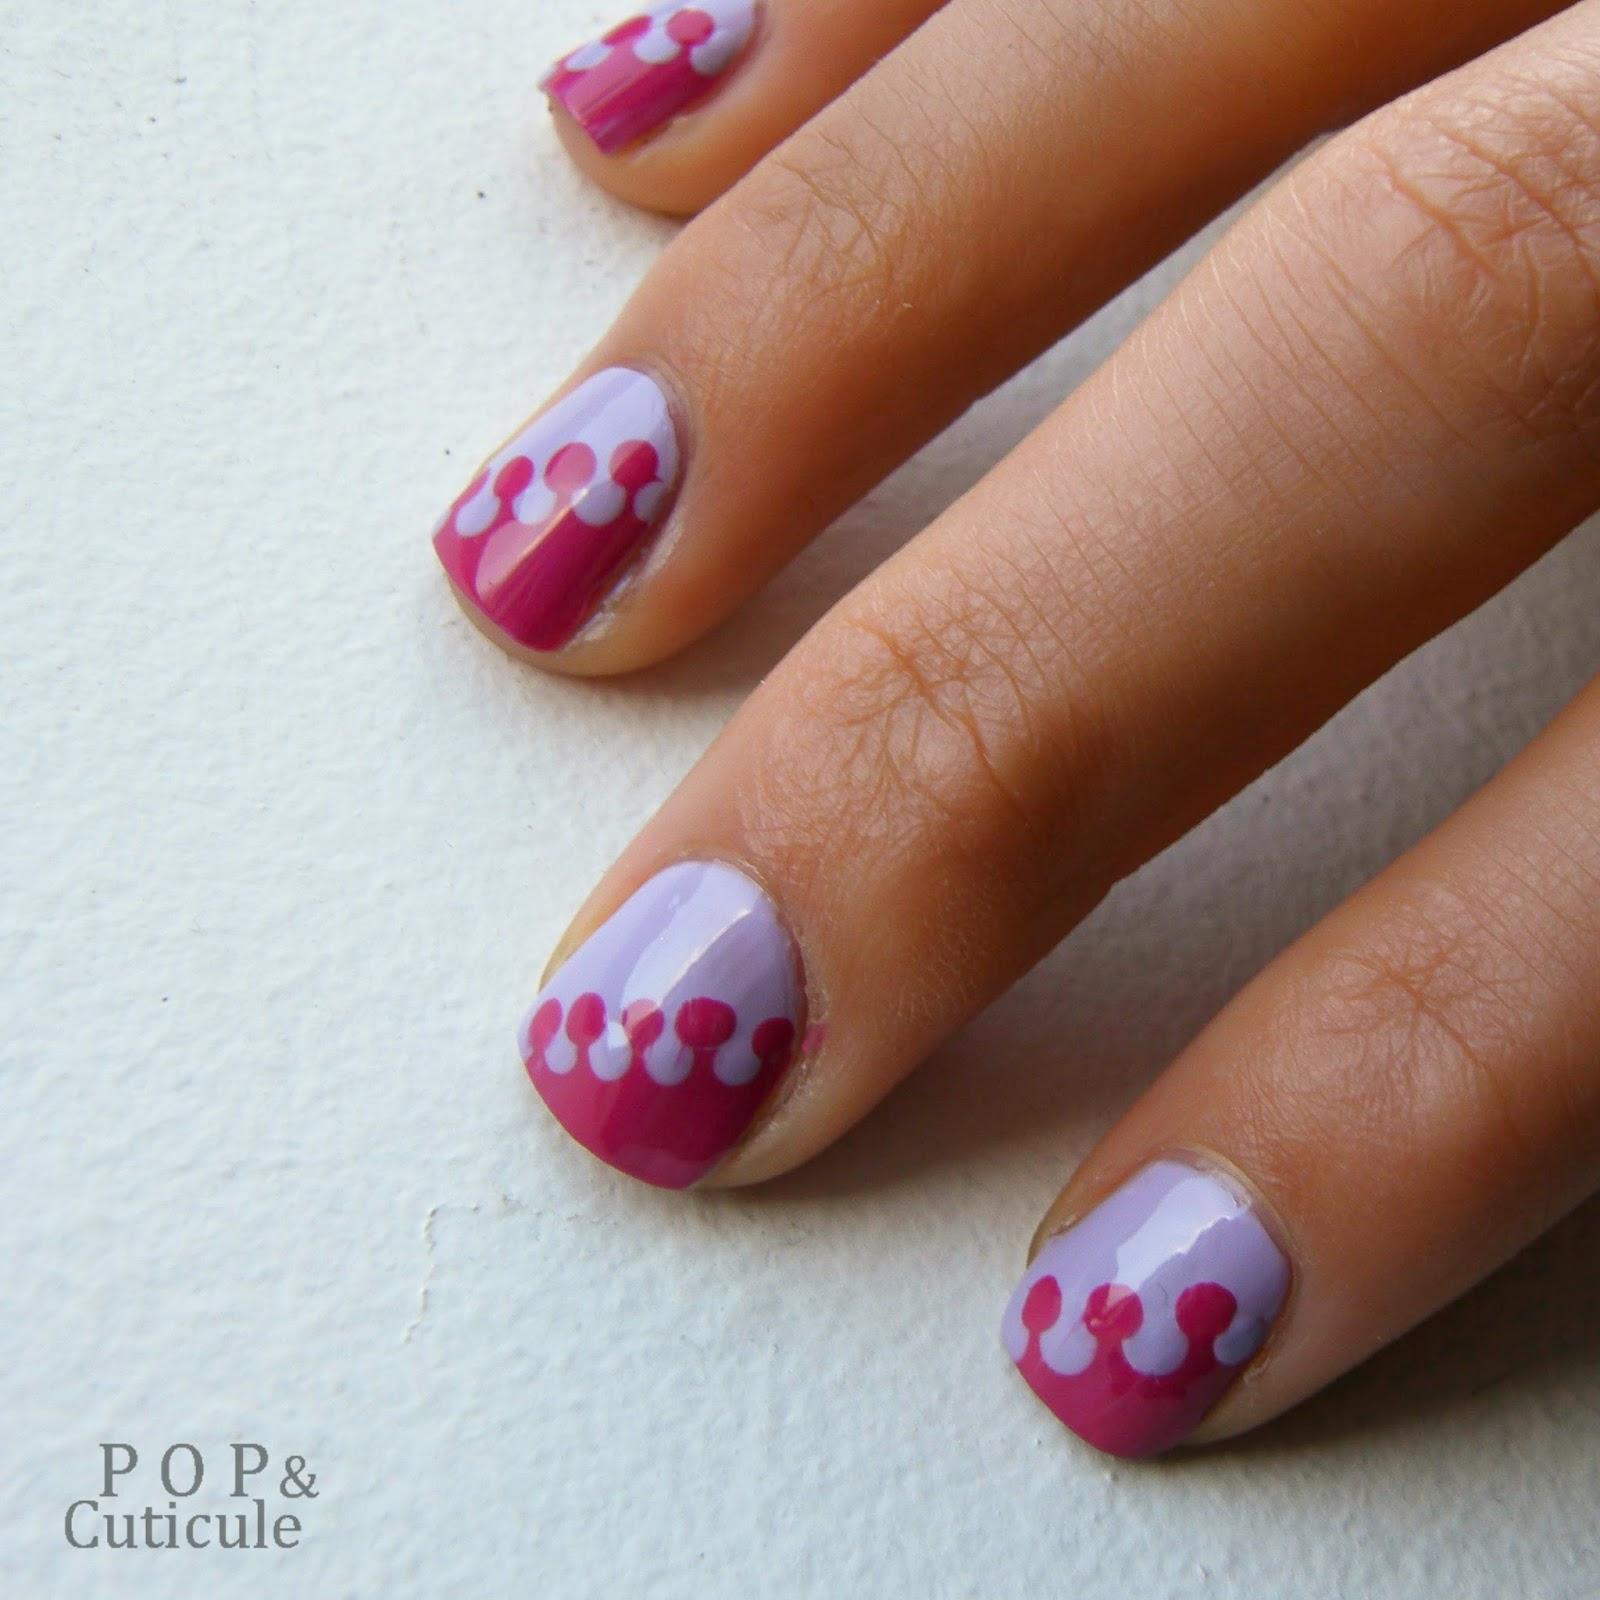 http://popncuticule.blogspot.fr/2014/04/tuto-nail-art-effet-puzzle.html